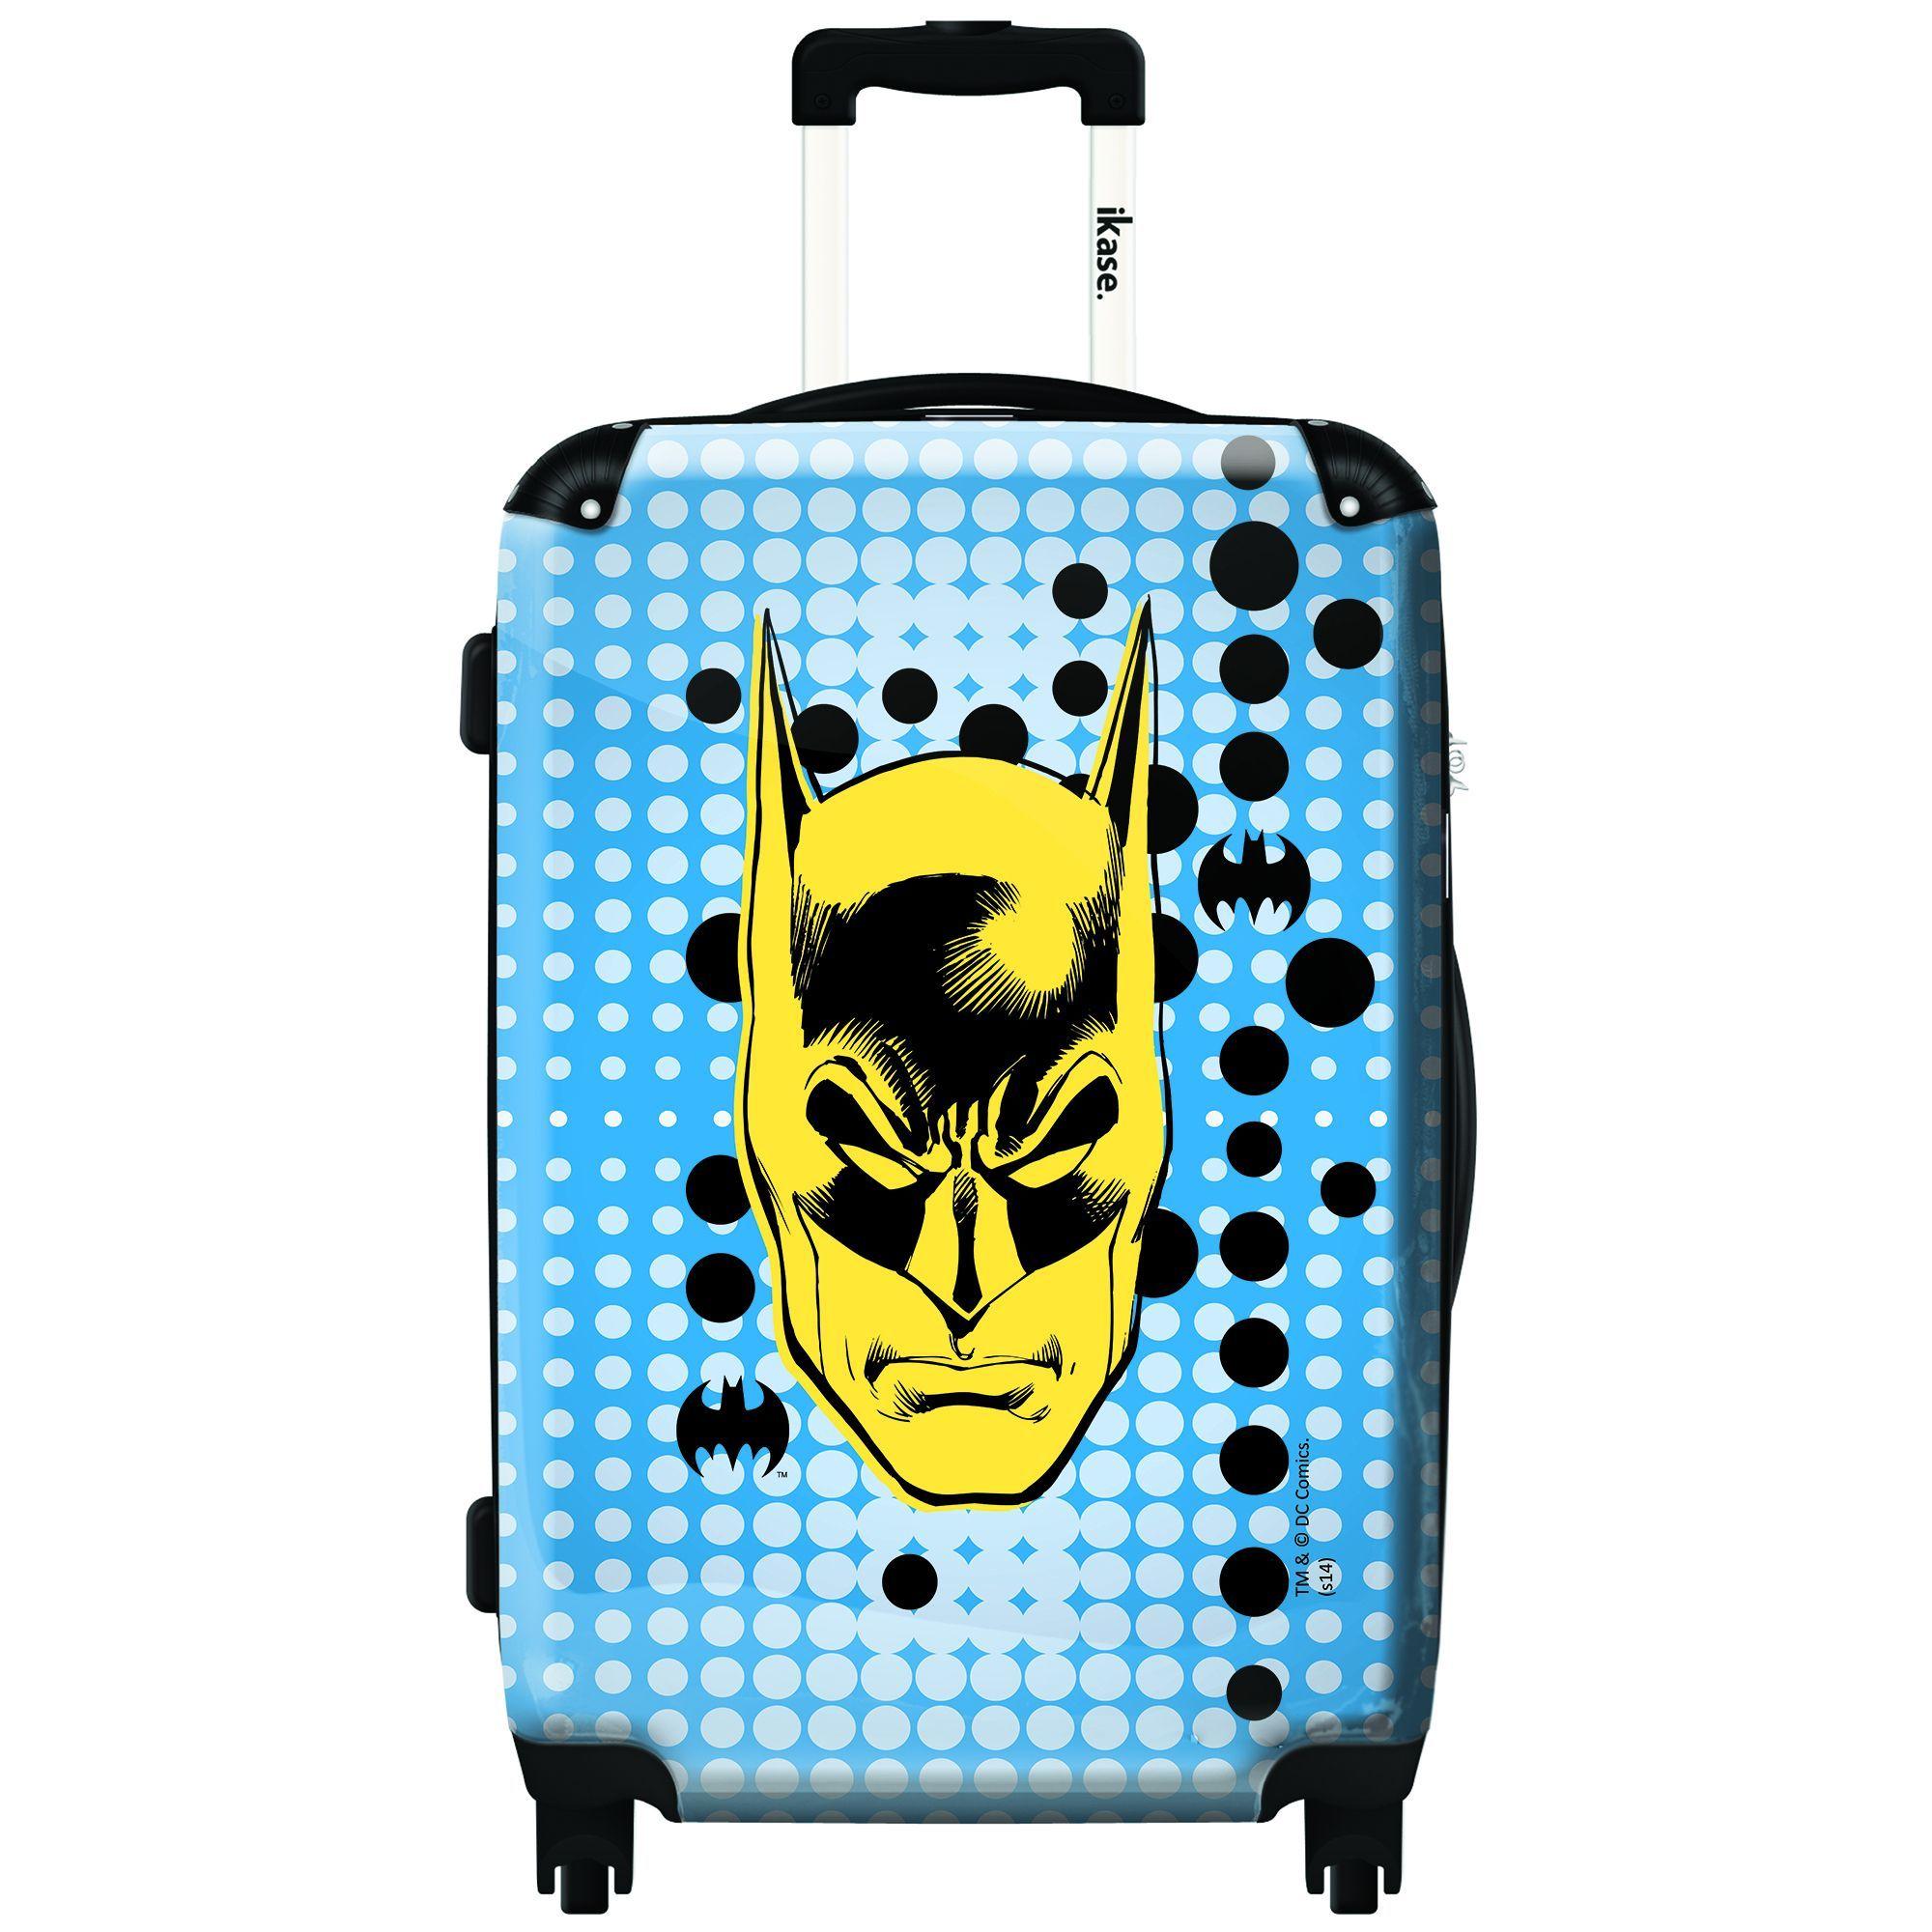 iKase 'Batman Pixel' 20-inch Fashion Hardside Carry-on Spinner Suitcase